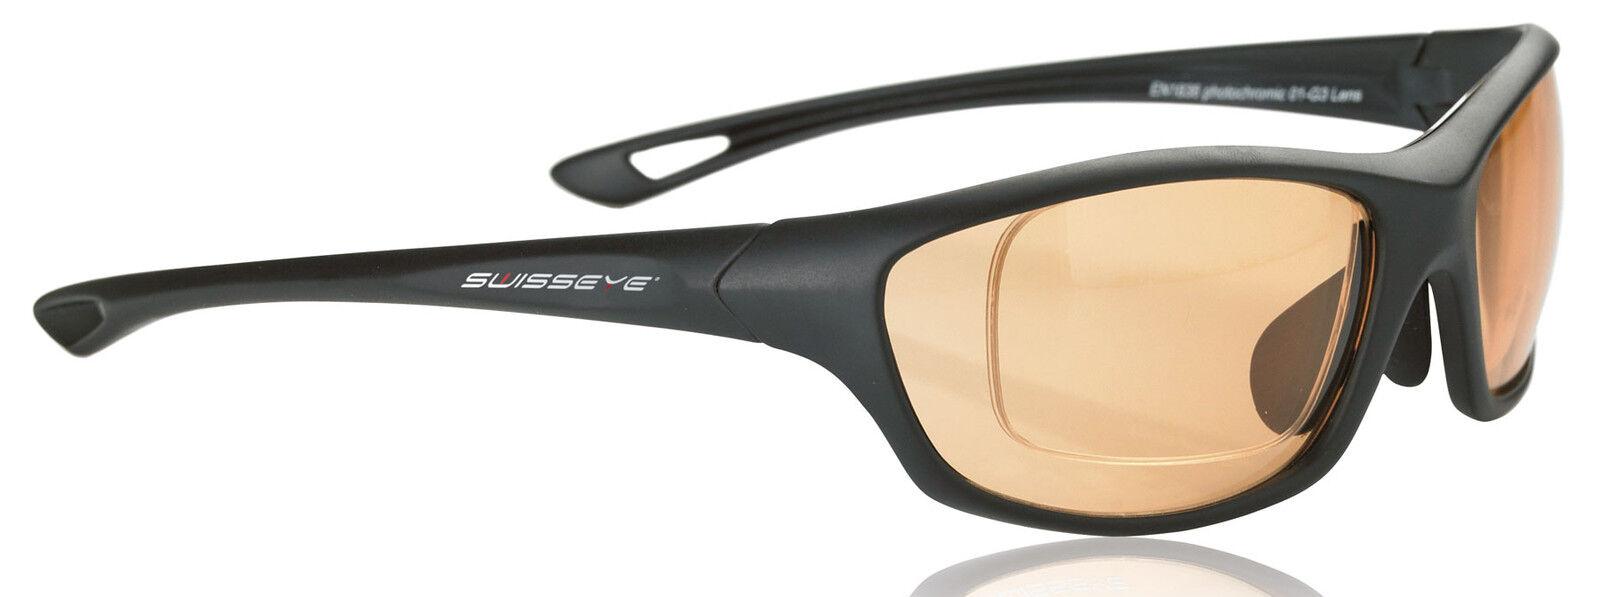 Swiss Eye deporte gafas  camaleón  negro Matt